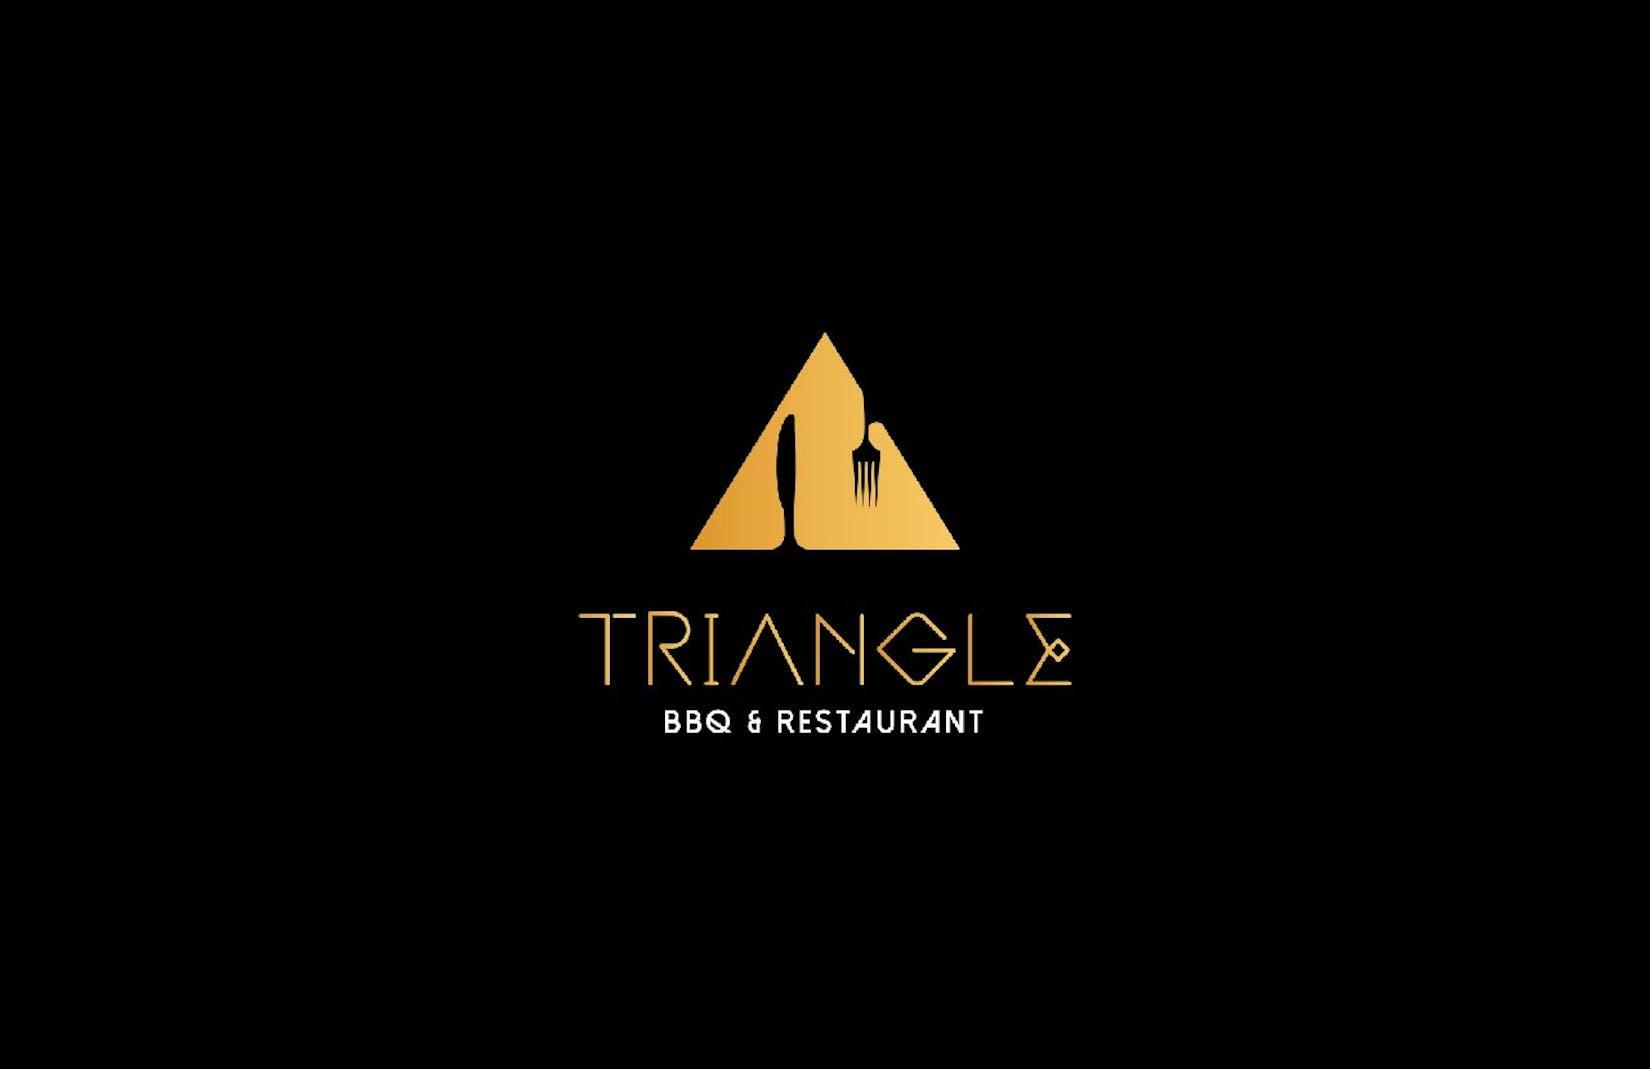 Triangle BBQ & Restaurant | yathar